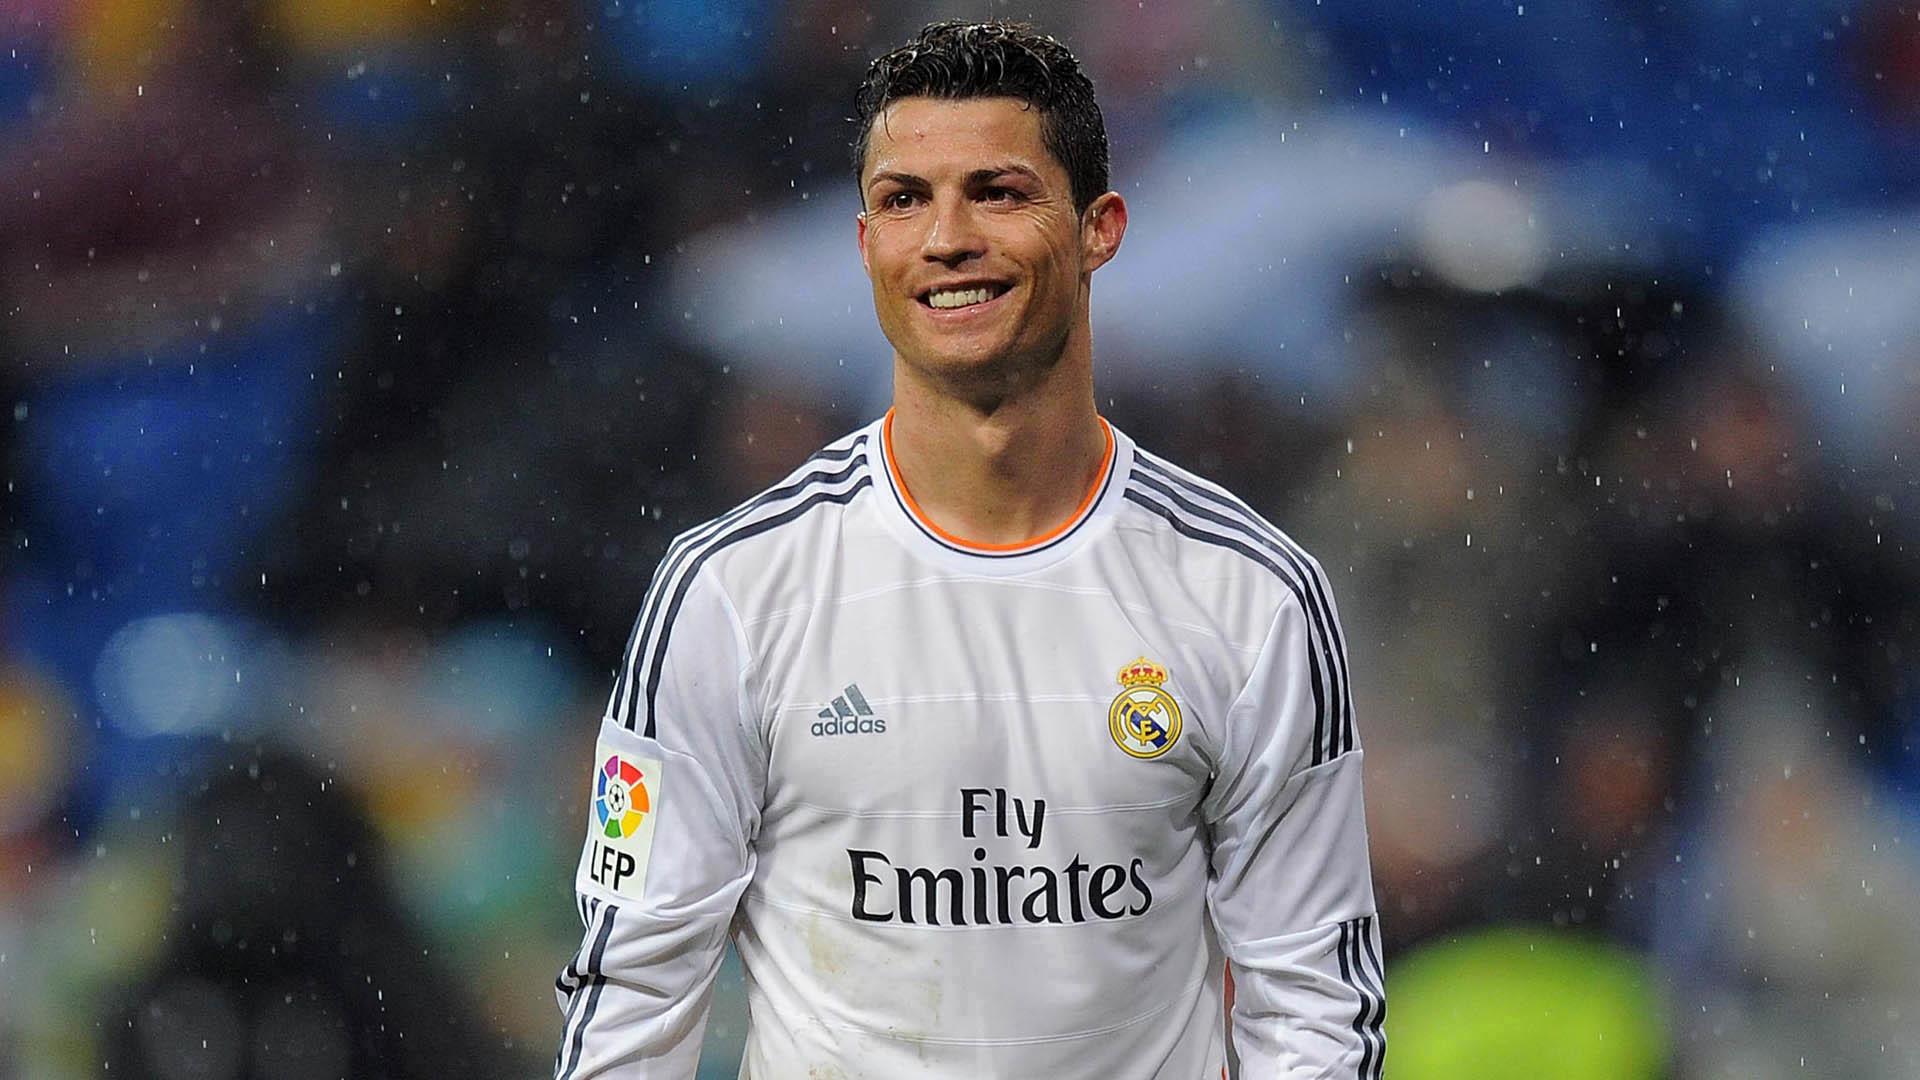 Cristiano Ronaldo Hd Wallpaper 74 Images